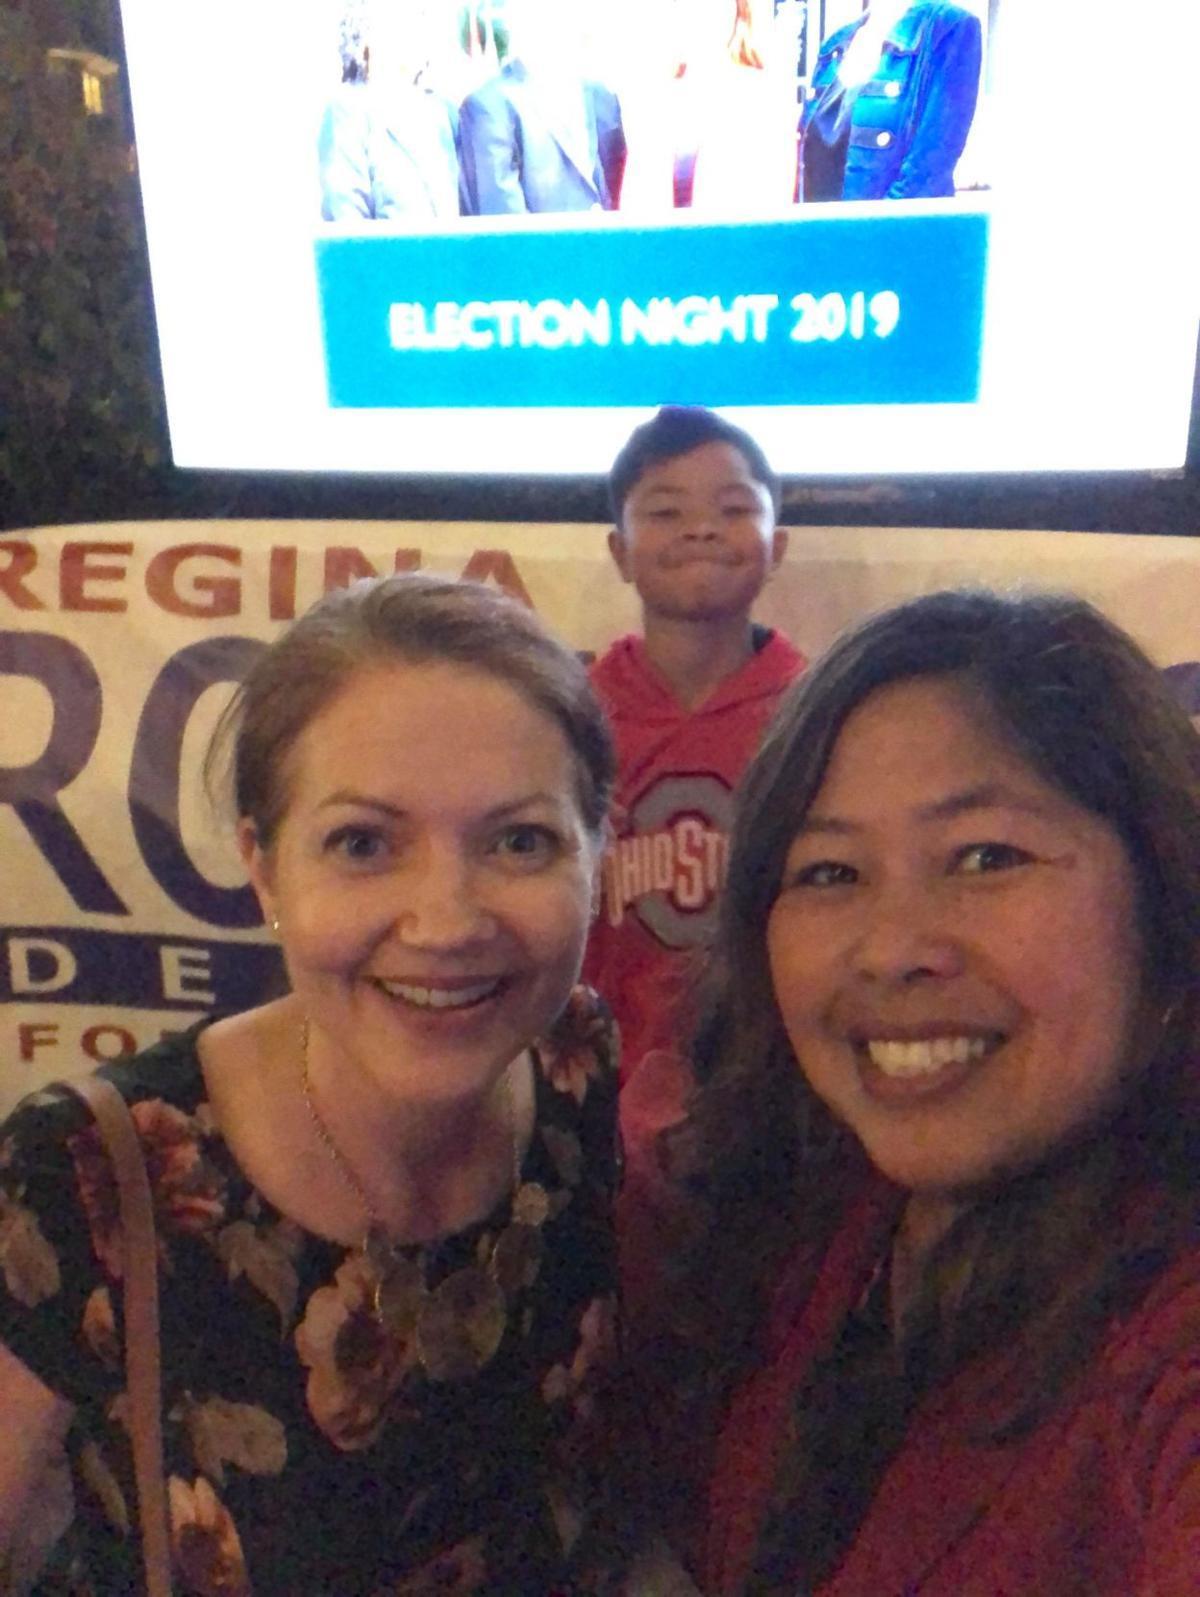 LeighAnn Rangel Sotomayor and Daisy Rodriguez Pitel